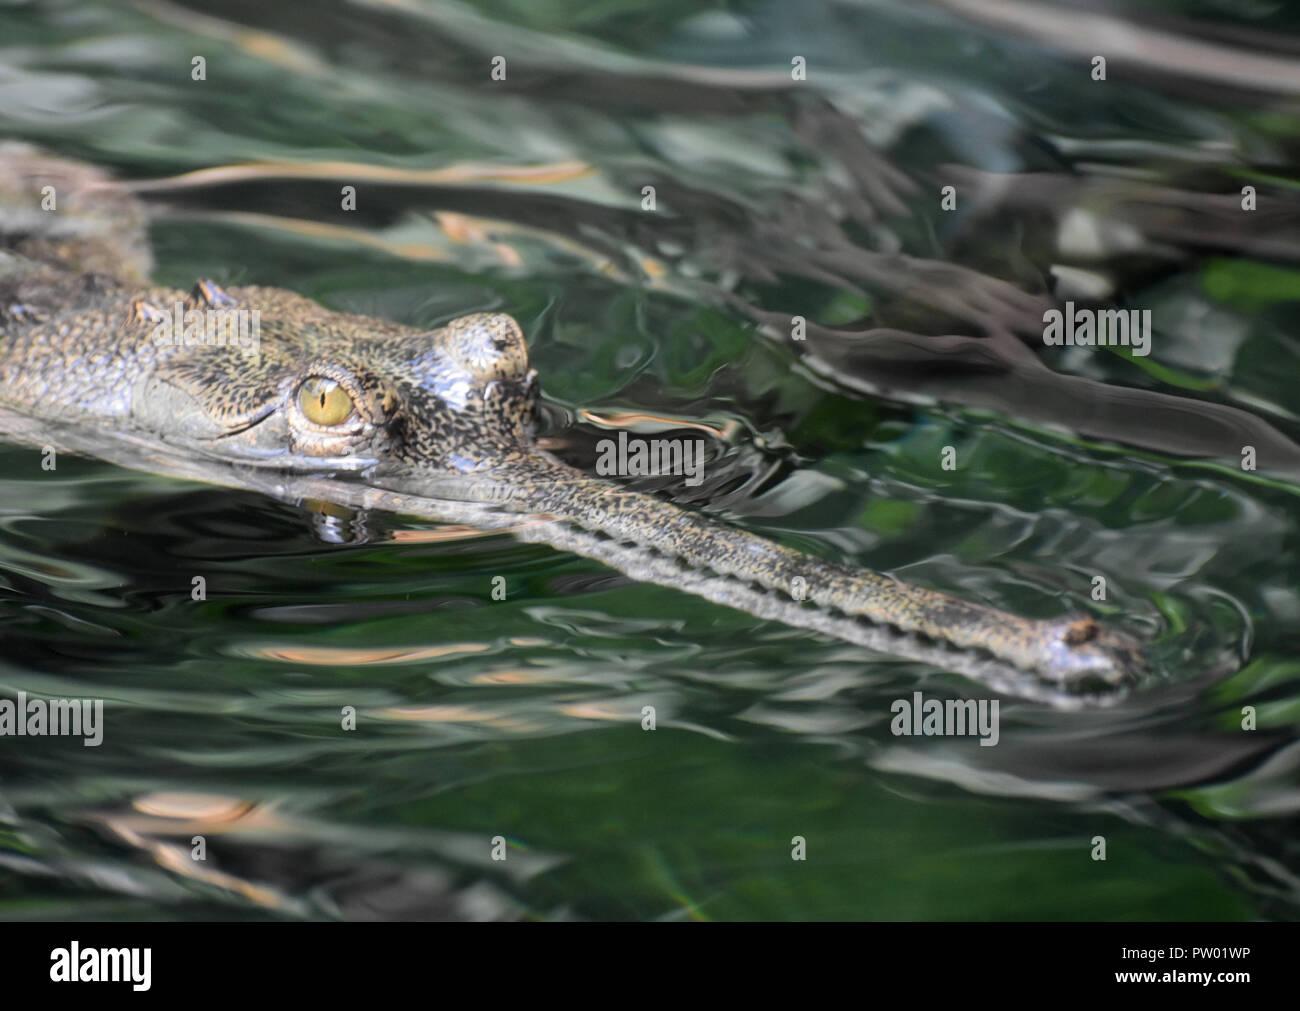 Menacing gavial crocodile in a river. - Stock Image